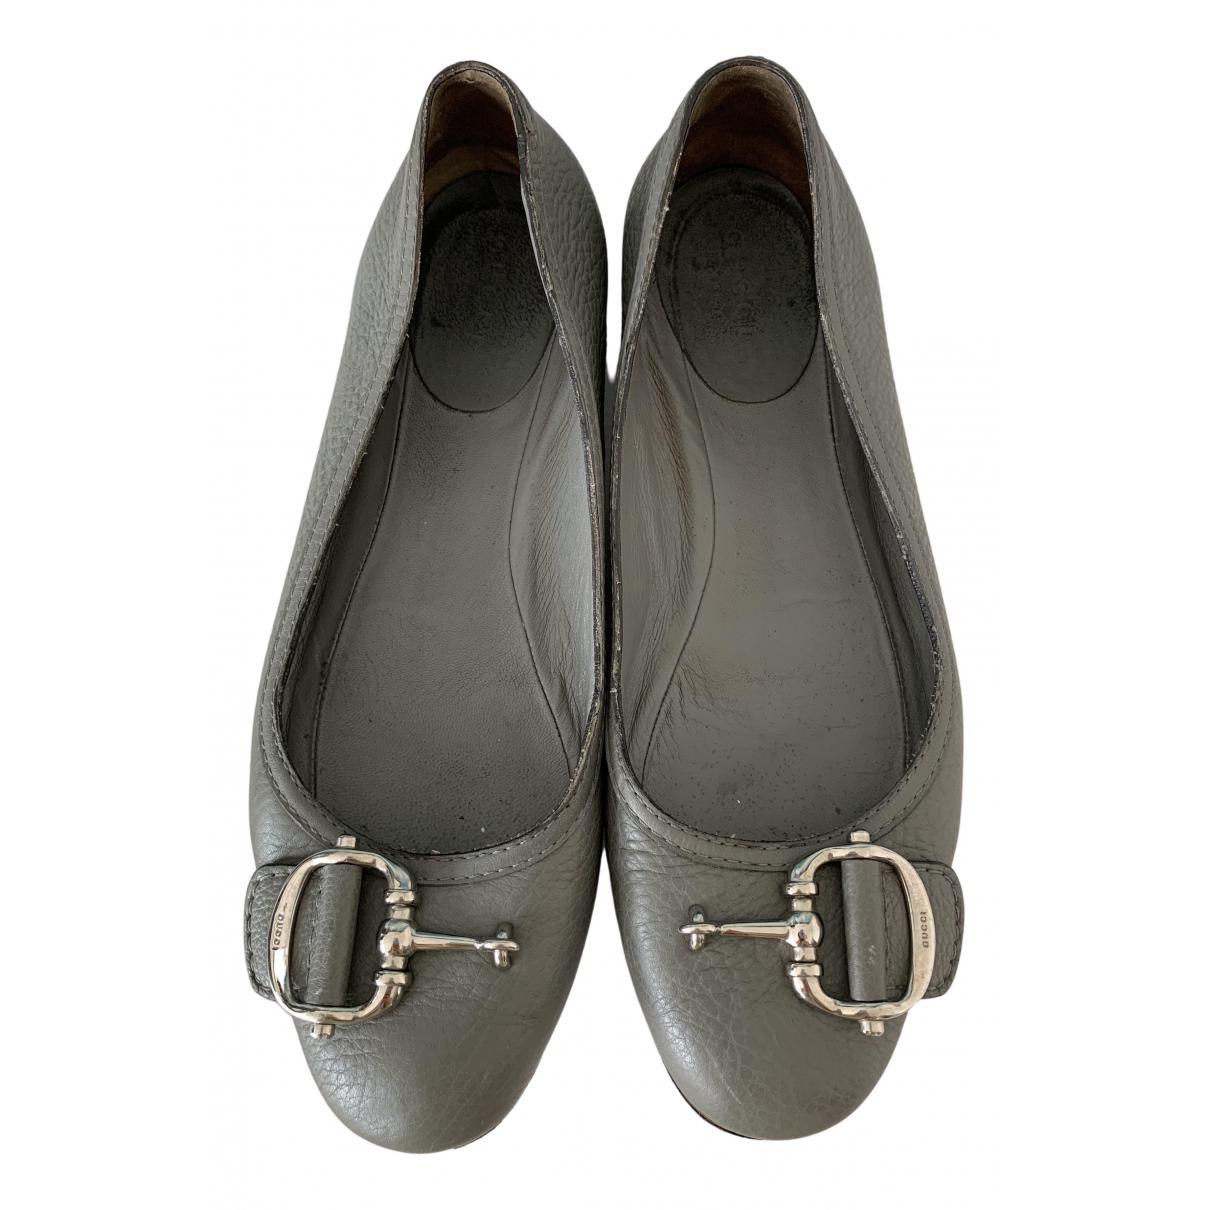 Gucci \N Ballerinas in  Grau Leder